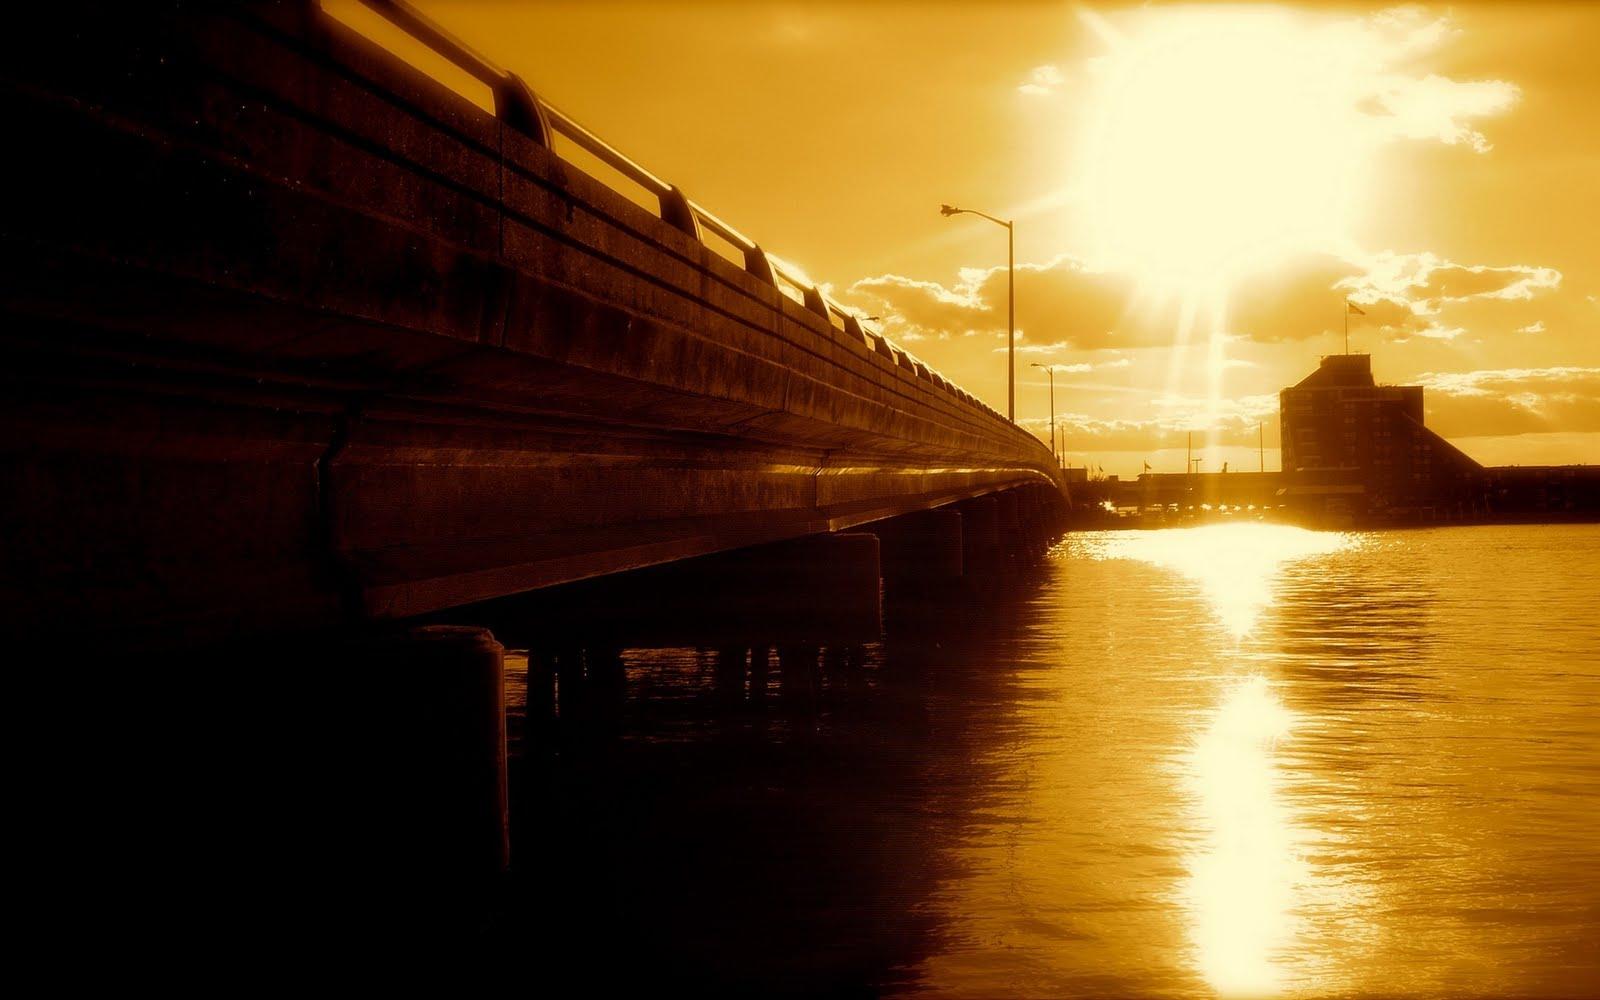 Sunrise Sunset 1600x1000